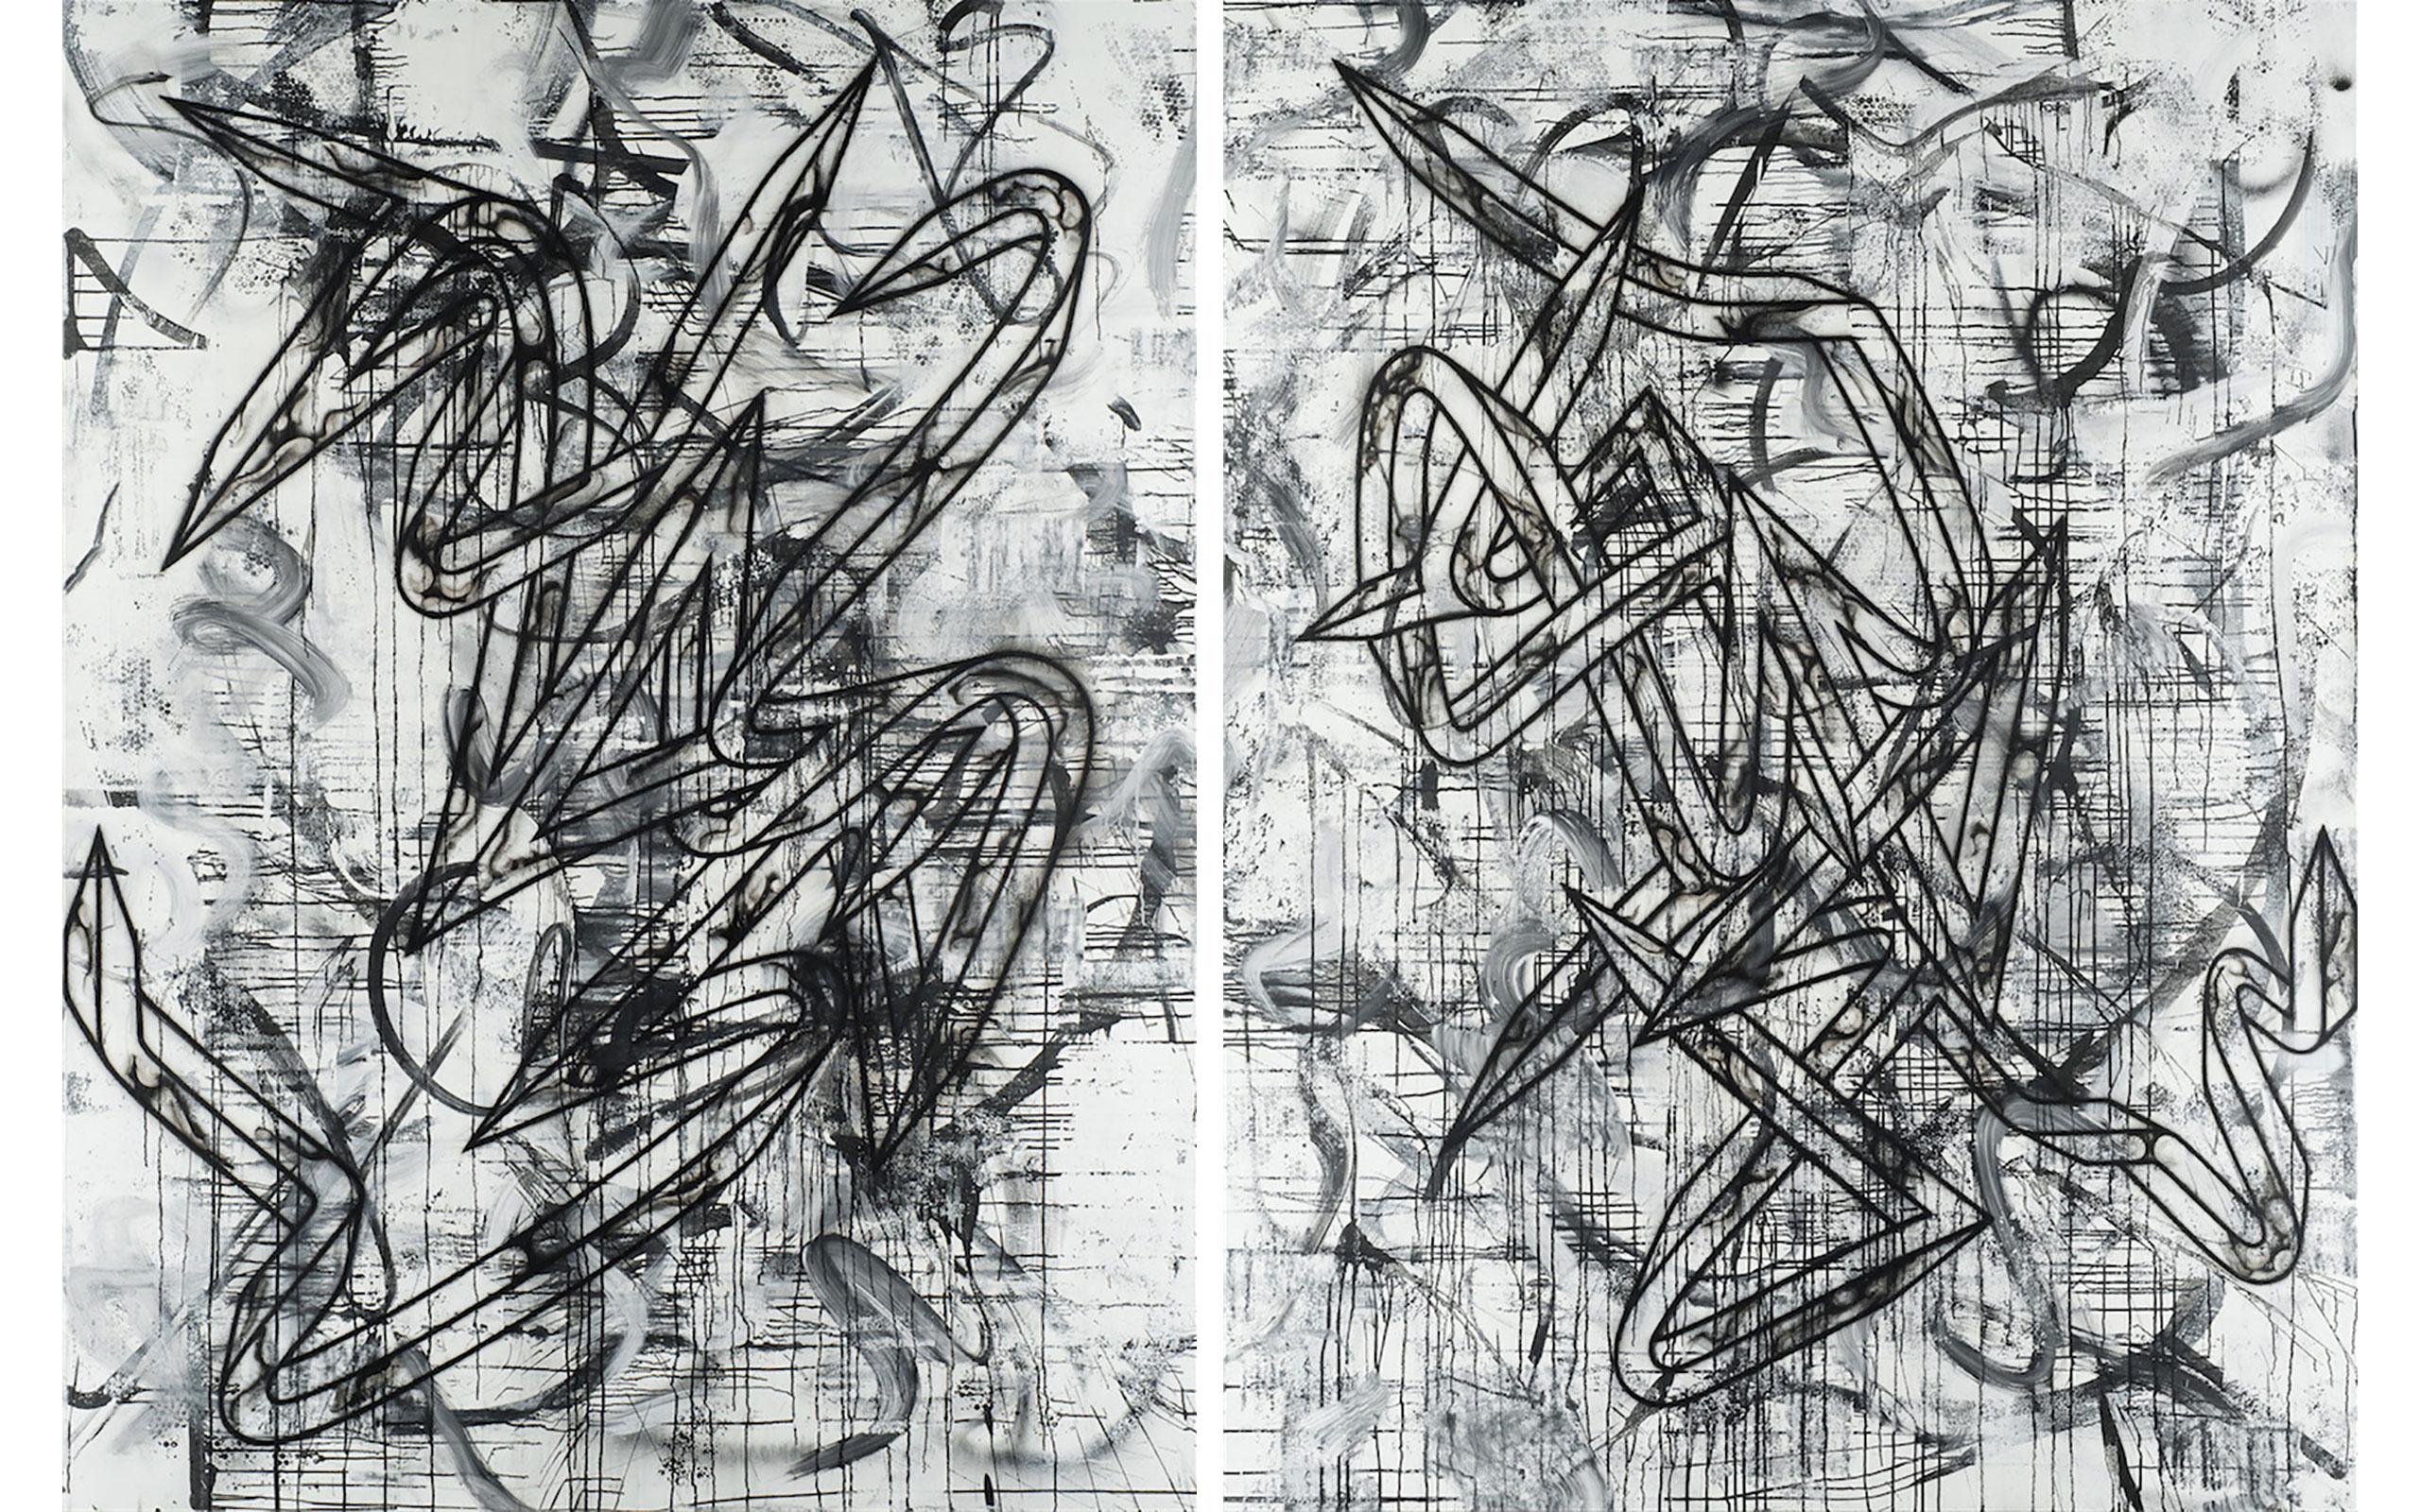 Enrico Isamu Ōyama To Held Exhibition 'Black' At Takuro Someya Contemporary Art